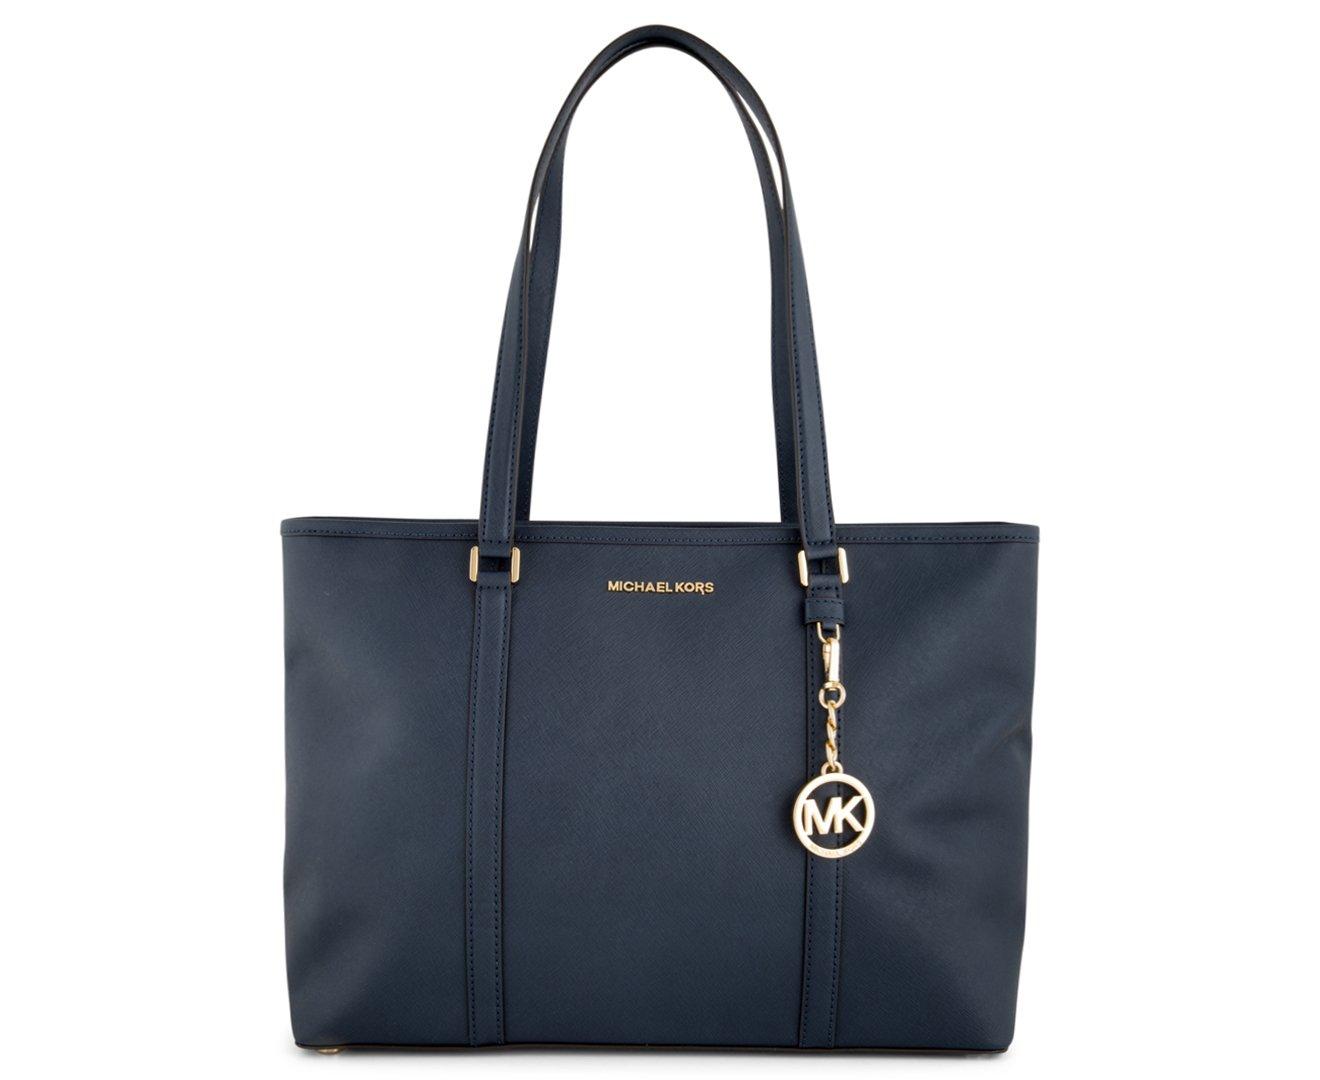 Michael Kors Sady Ladies Large Leather Tote Handbag 35T7GD4T7L406